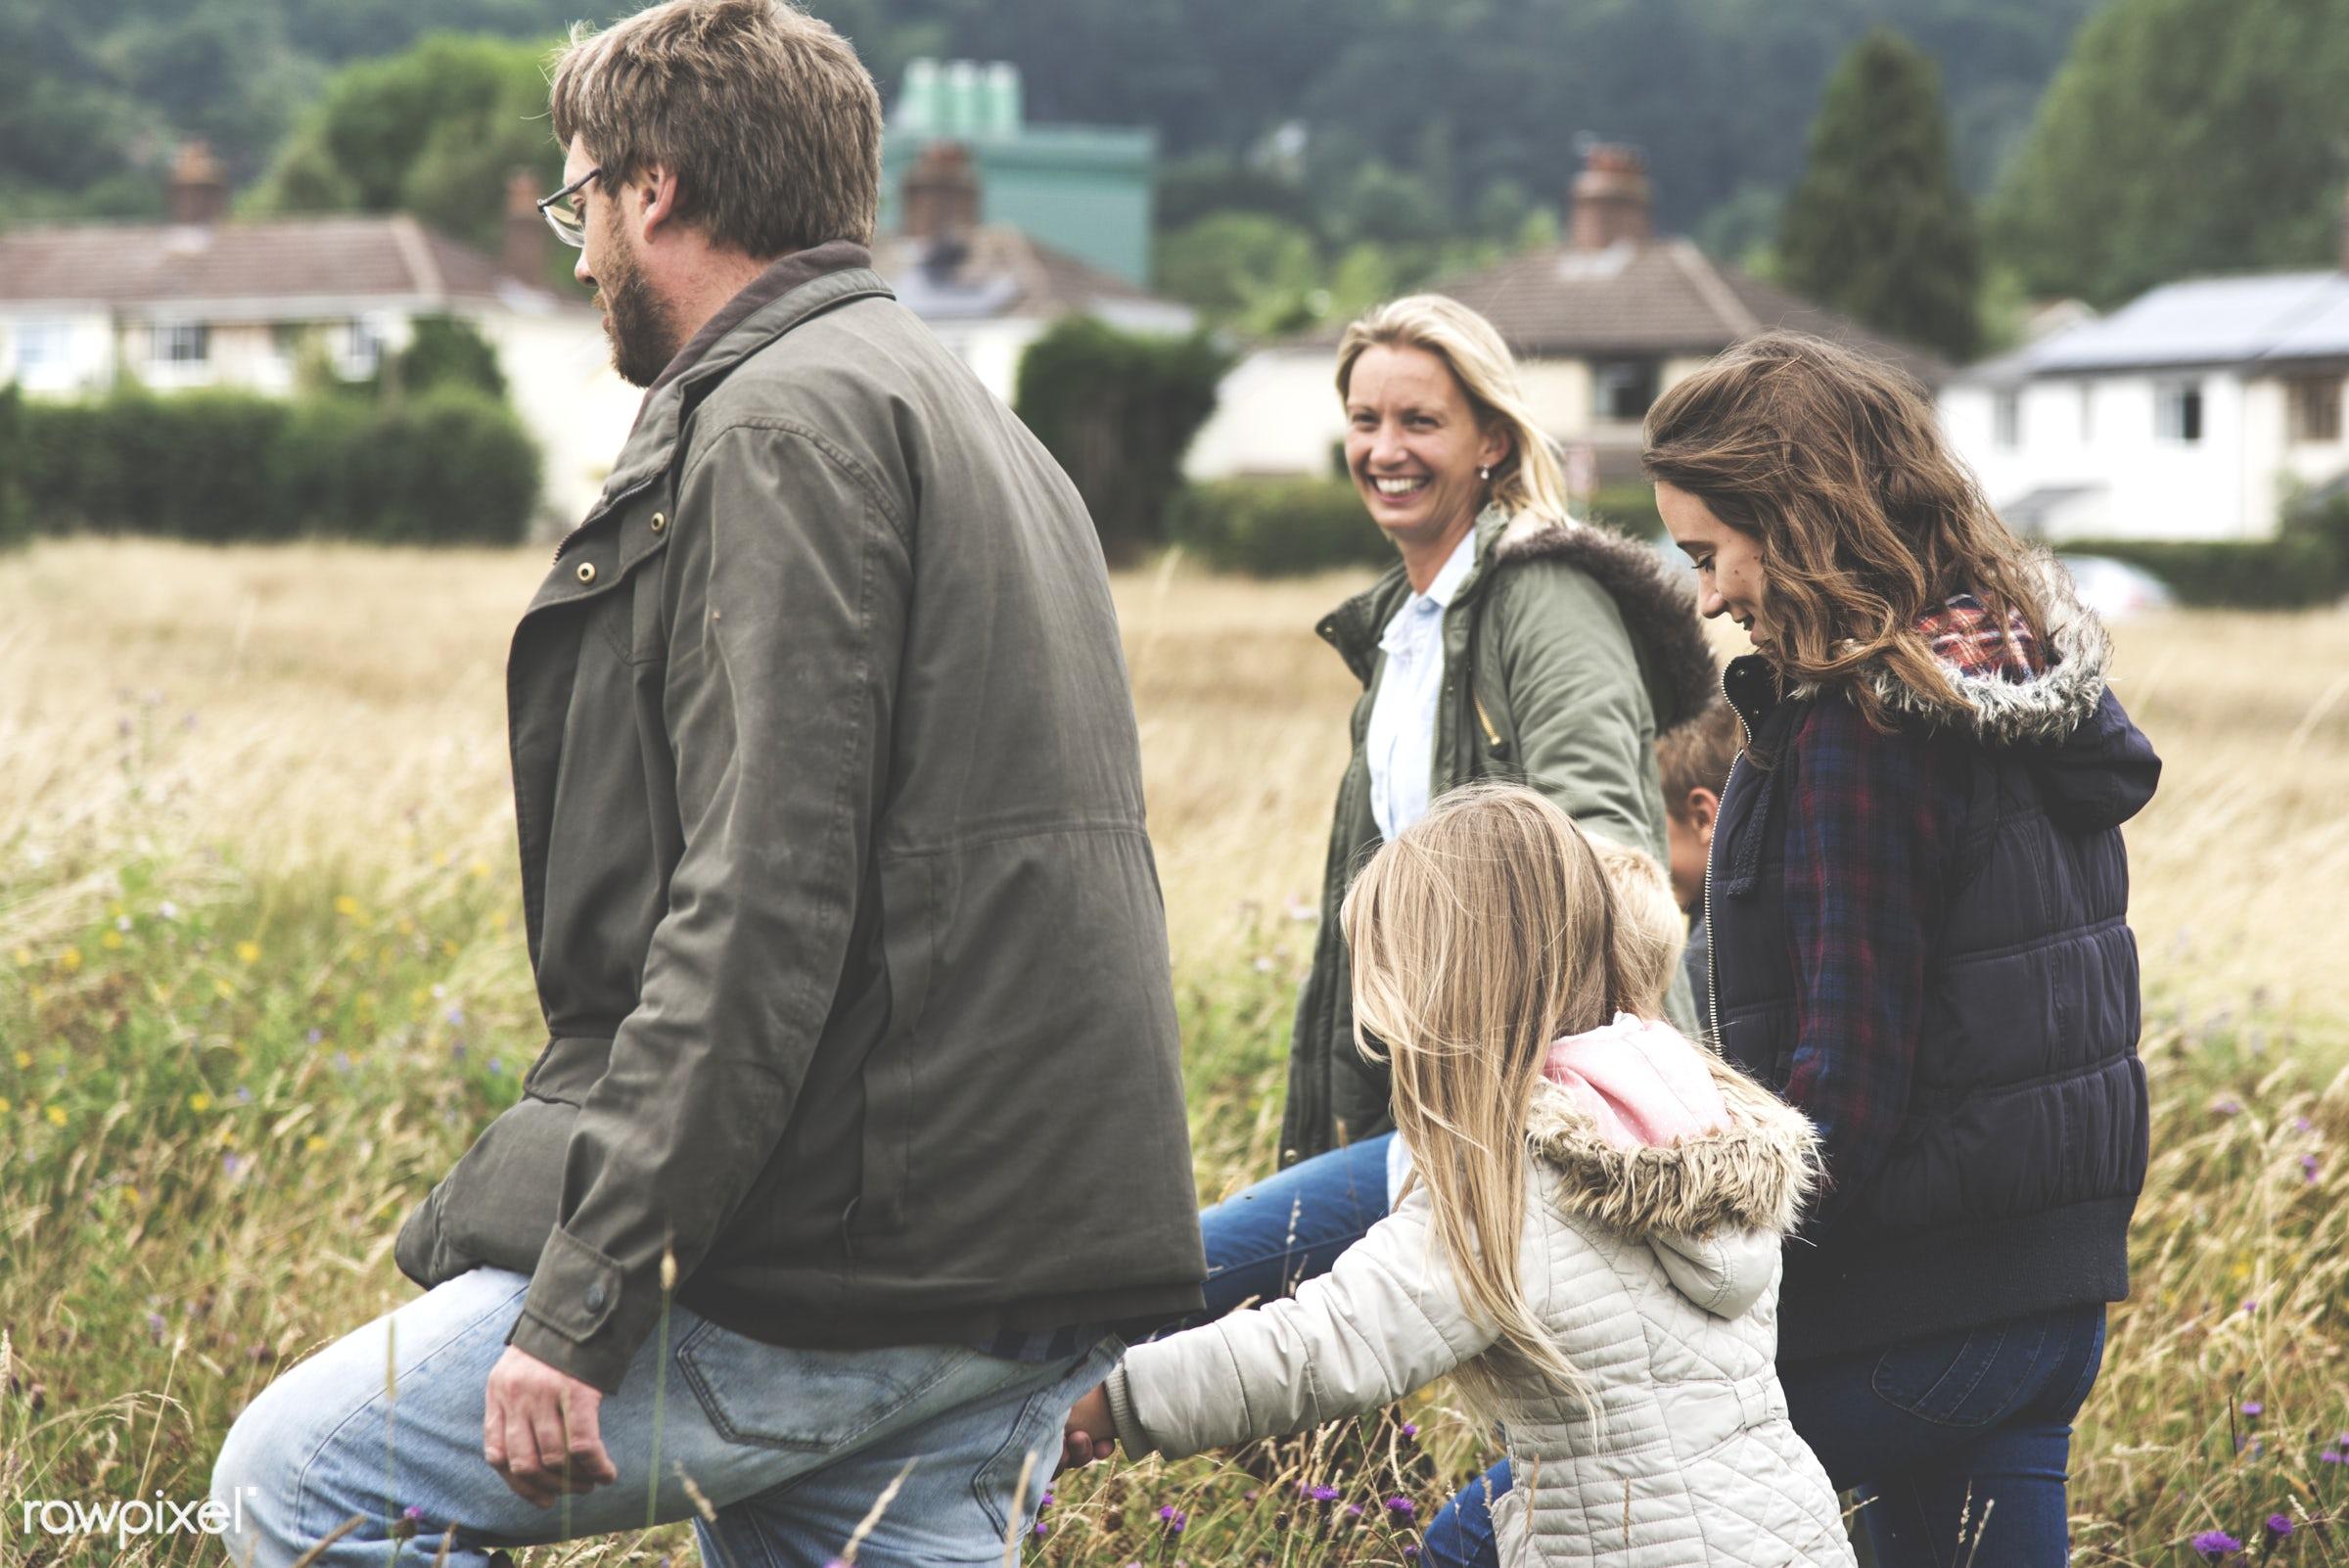 Happy family in the park - bonding, cheerful, children, enjoyment, family, father, field, fun, garden, generations, grass,...